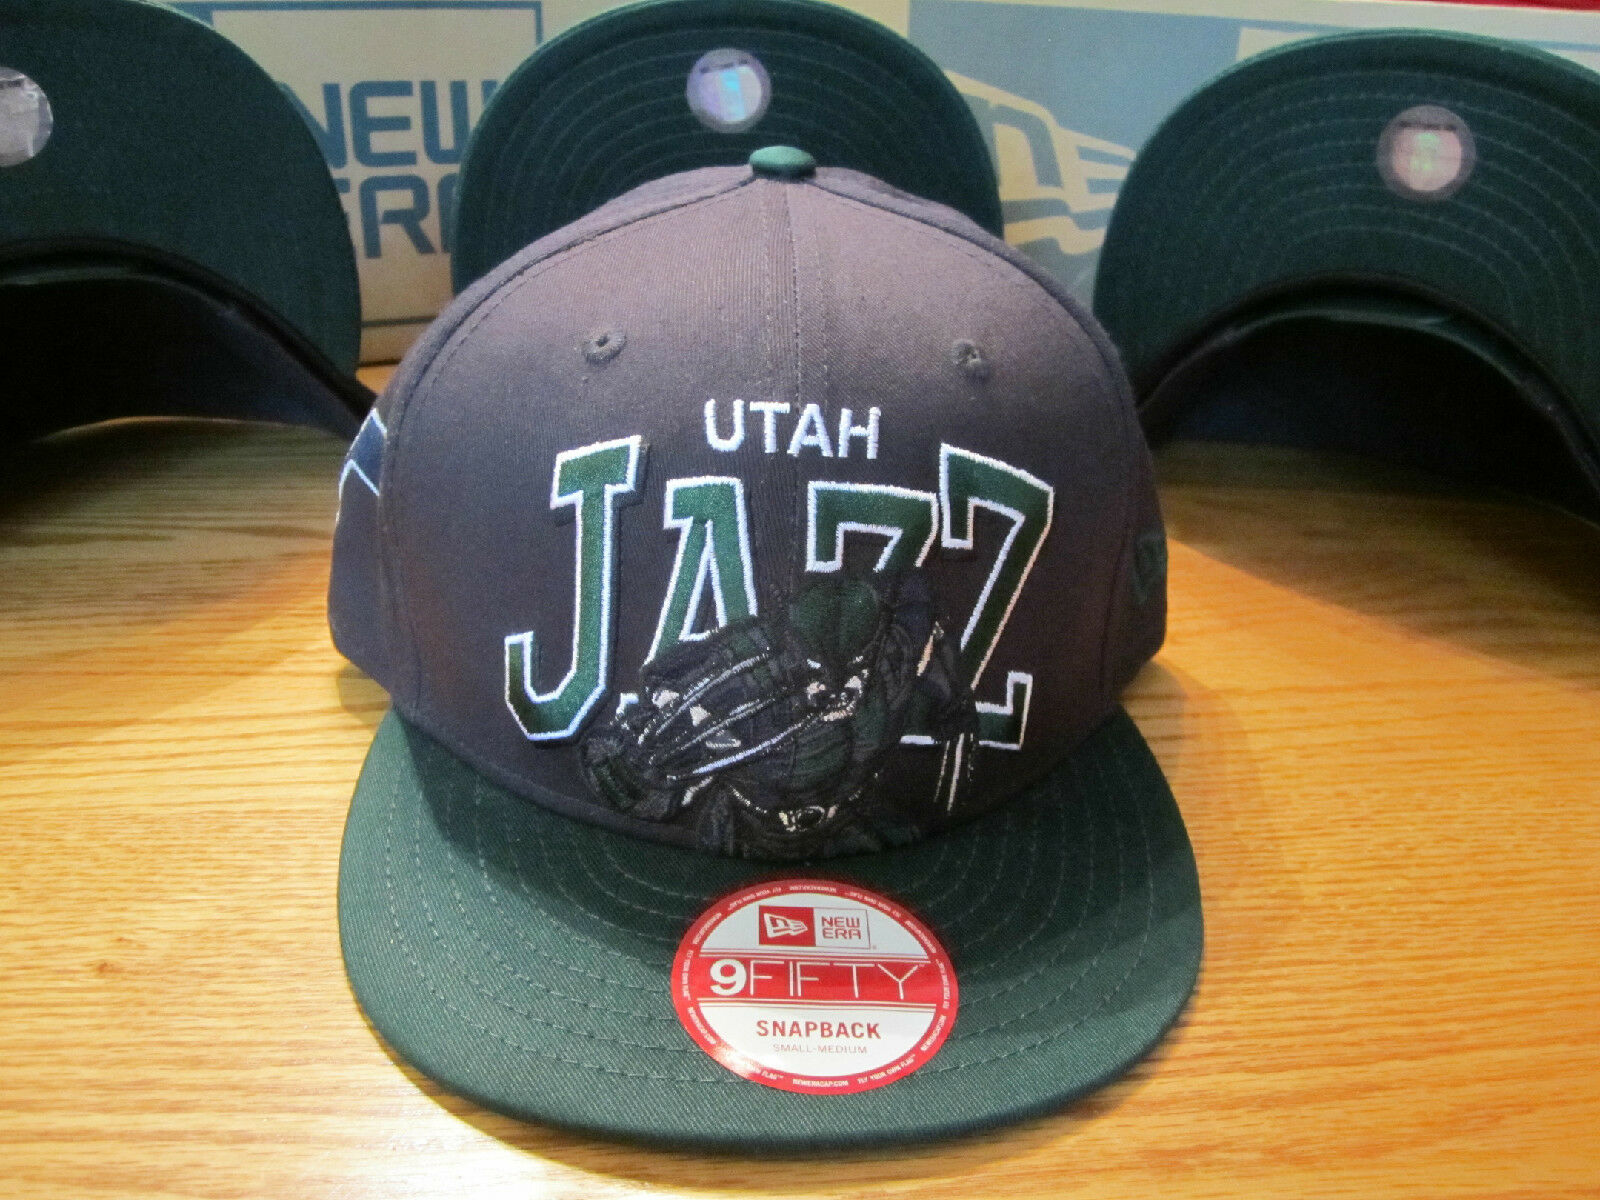 online retailer 58972 2323f ... discount code for wolverine x men utah hat jazz nba new era hat utah  snapback adjustable